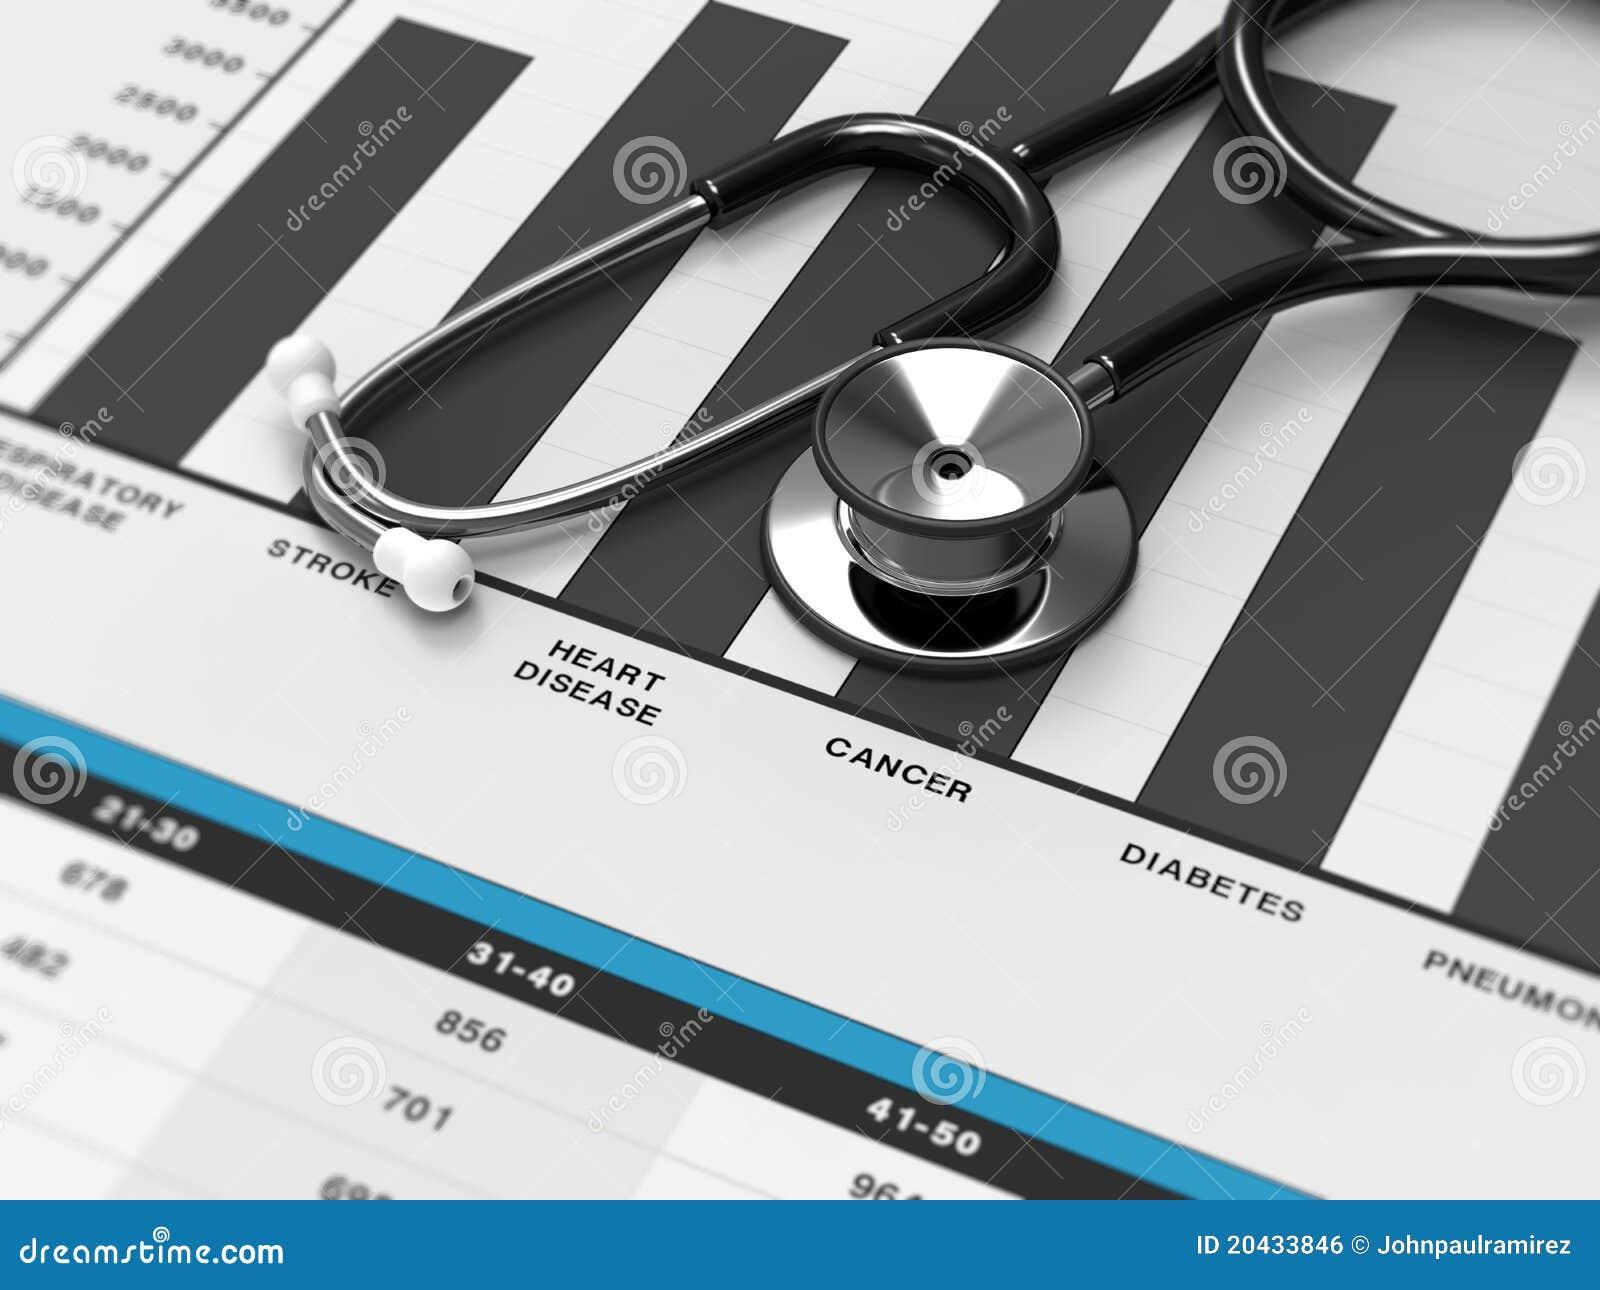 Stethoscope, Chart, Diseases, Medical, Healthcare Stock Illustration